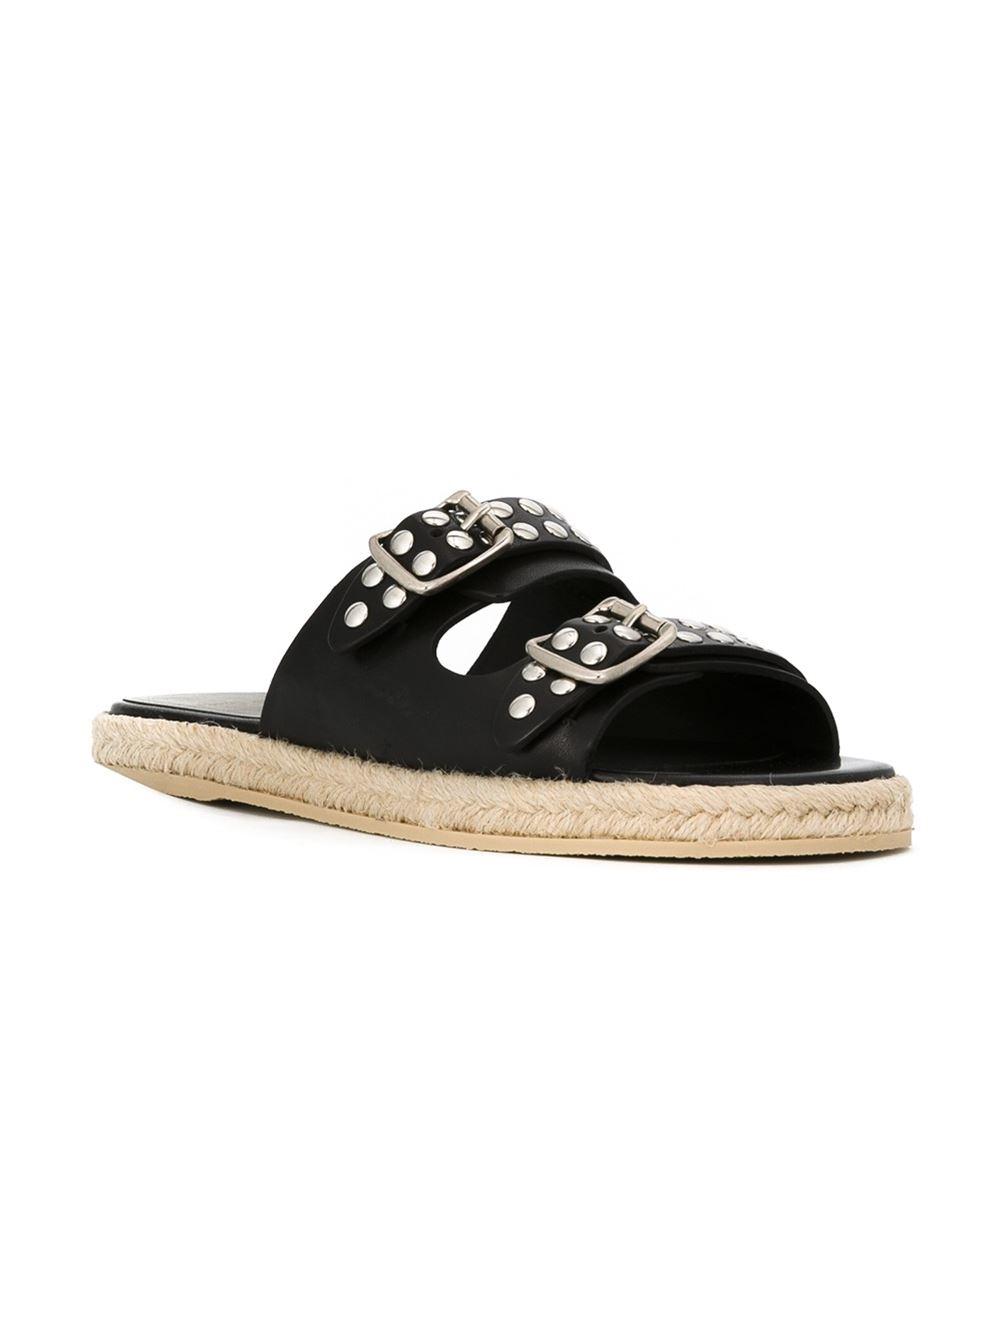 Saint Laurent Studded Calfskin Sandals In Black Lyst